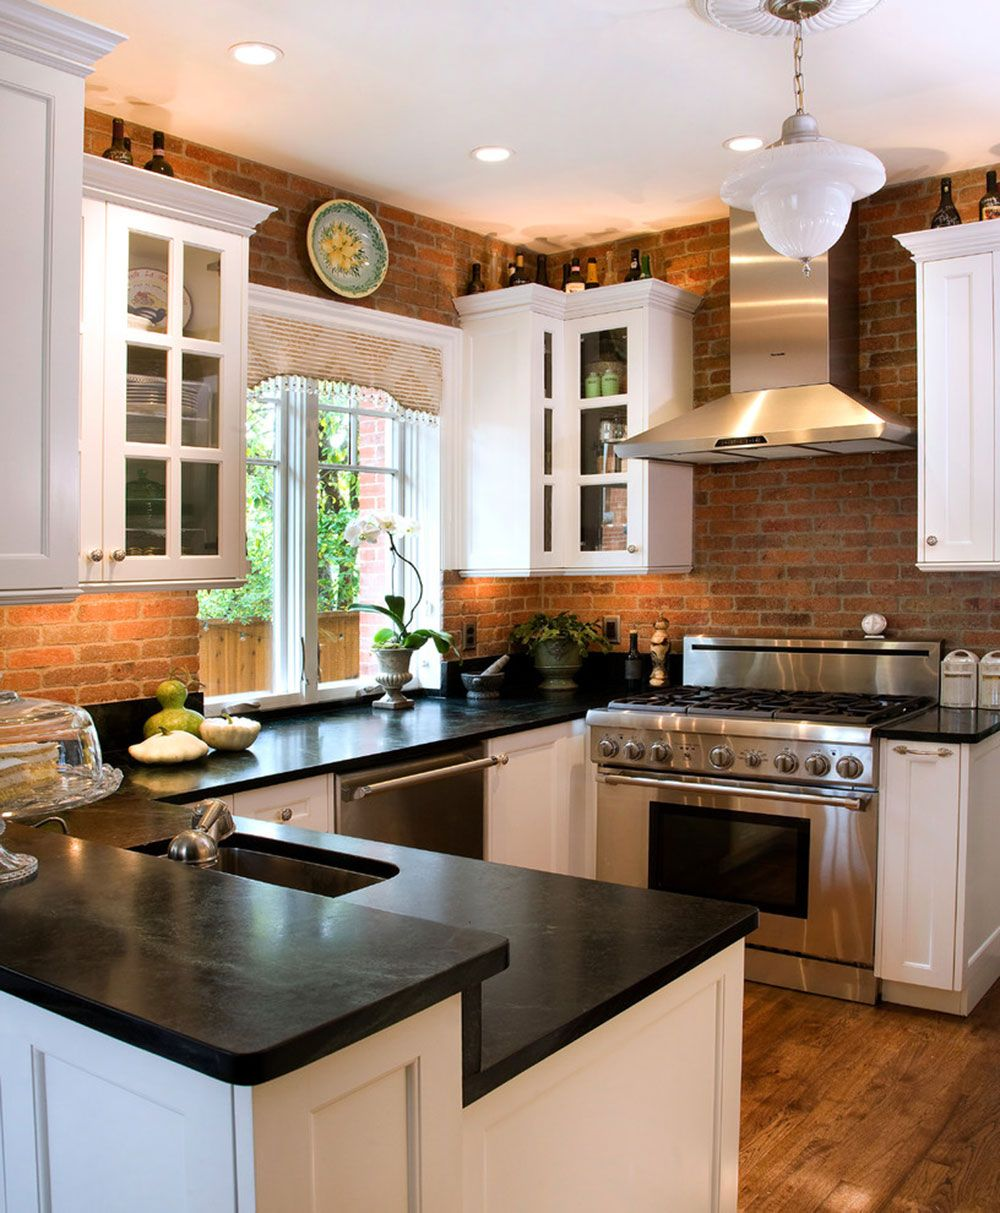 Modern Brick Backsplash Kitchen Ideas Exposed brick